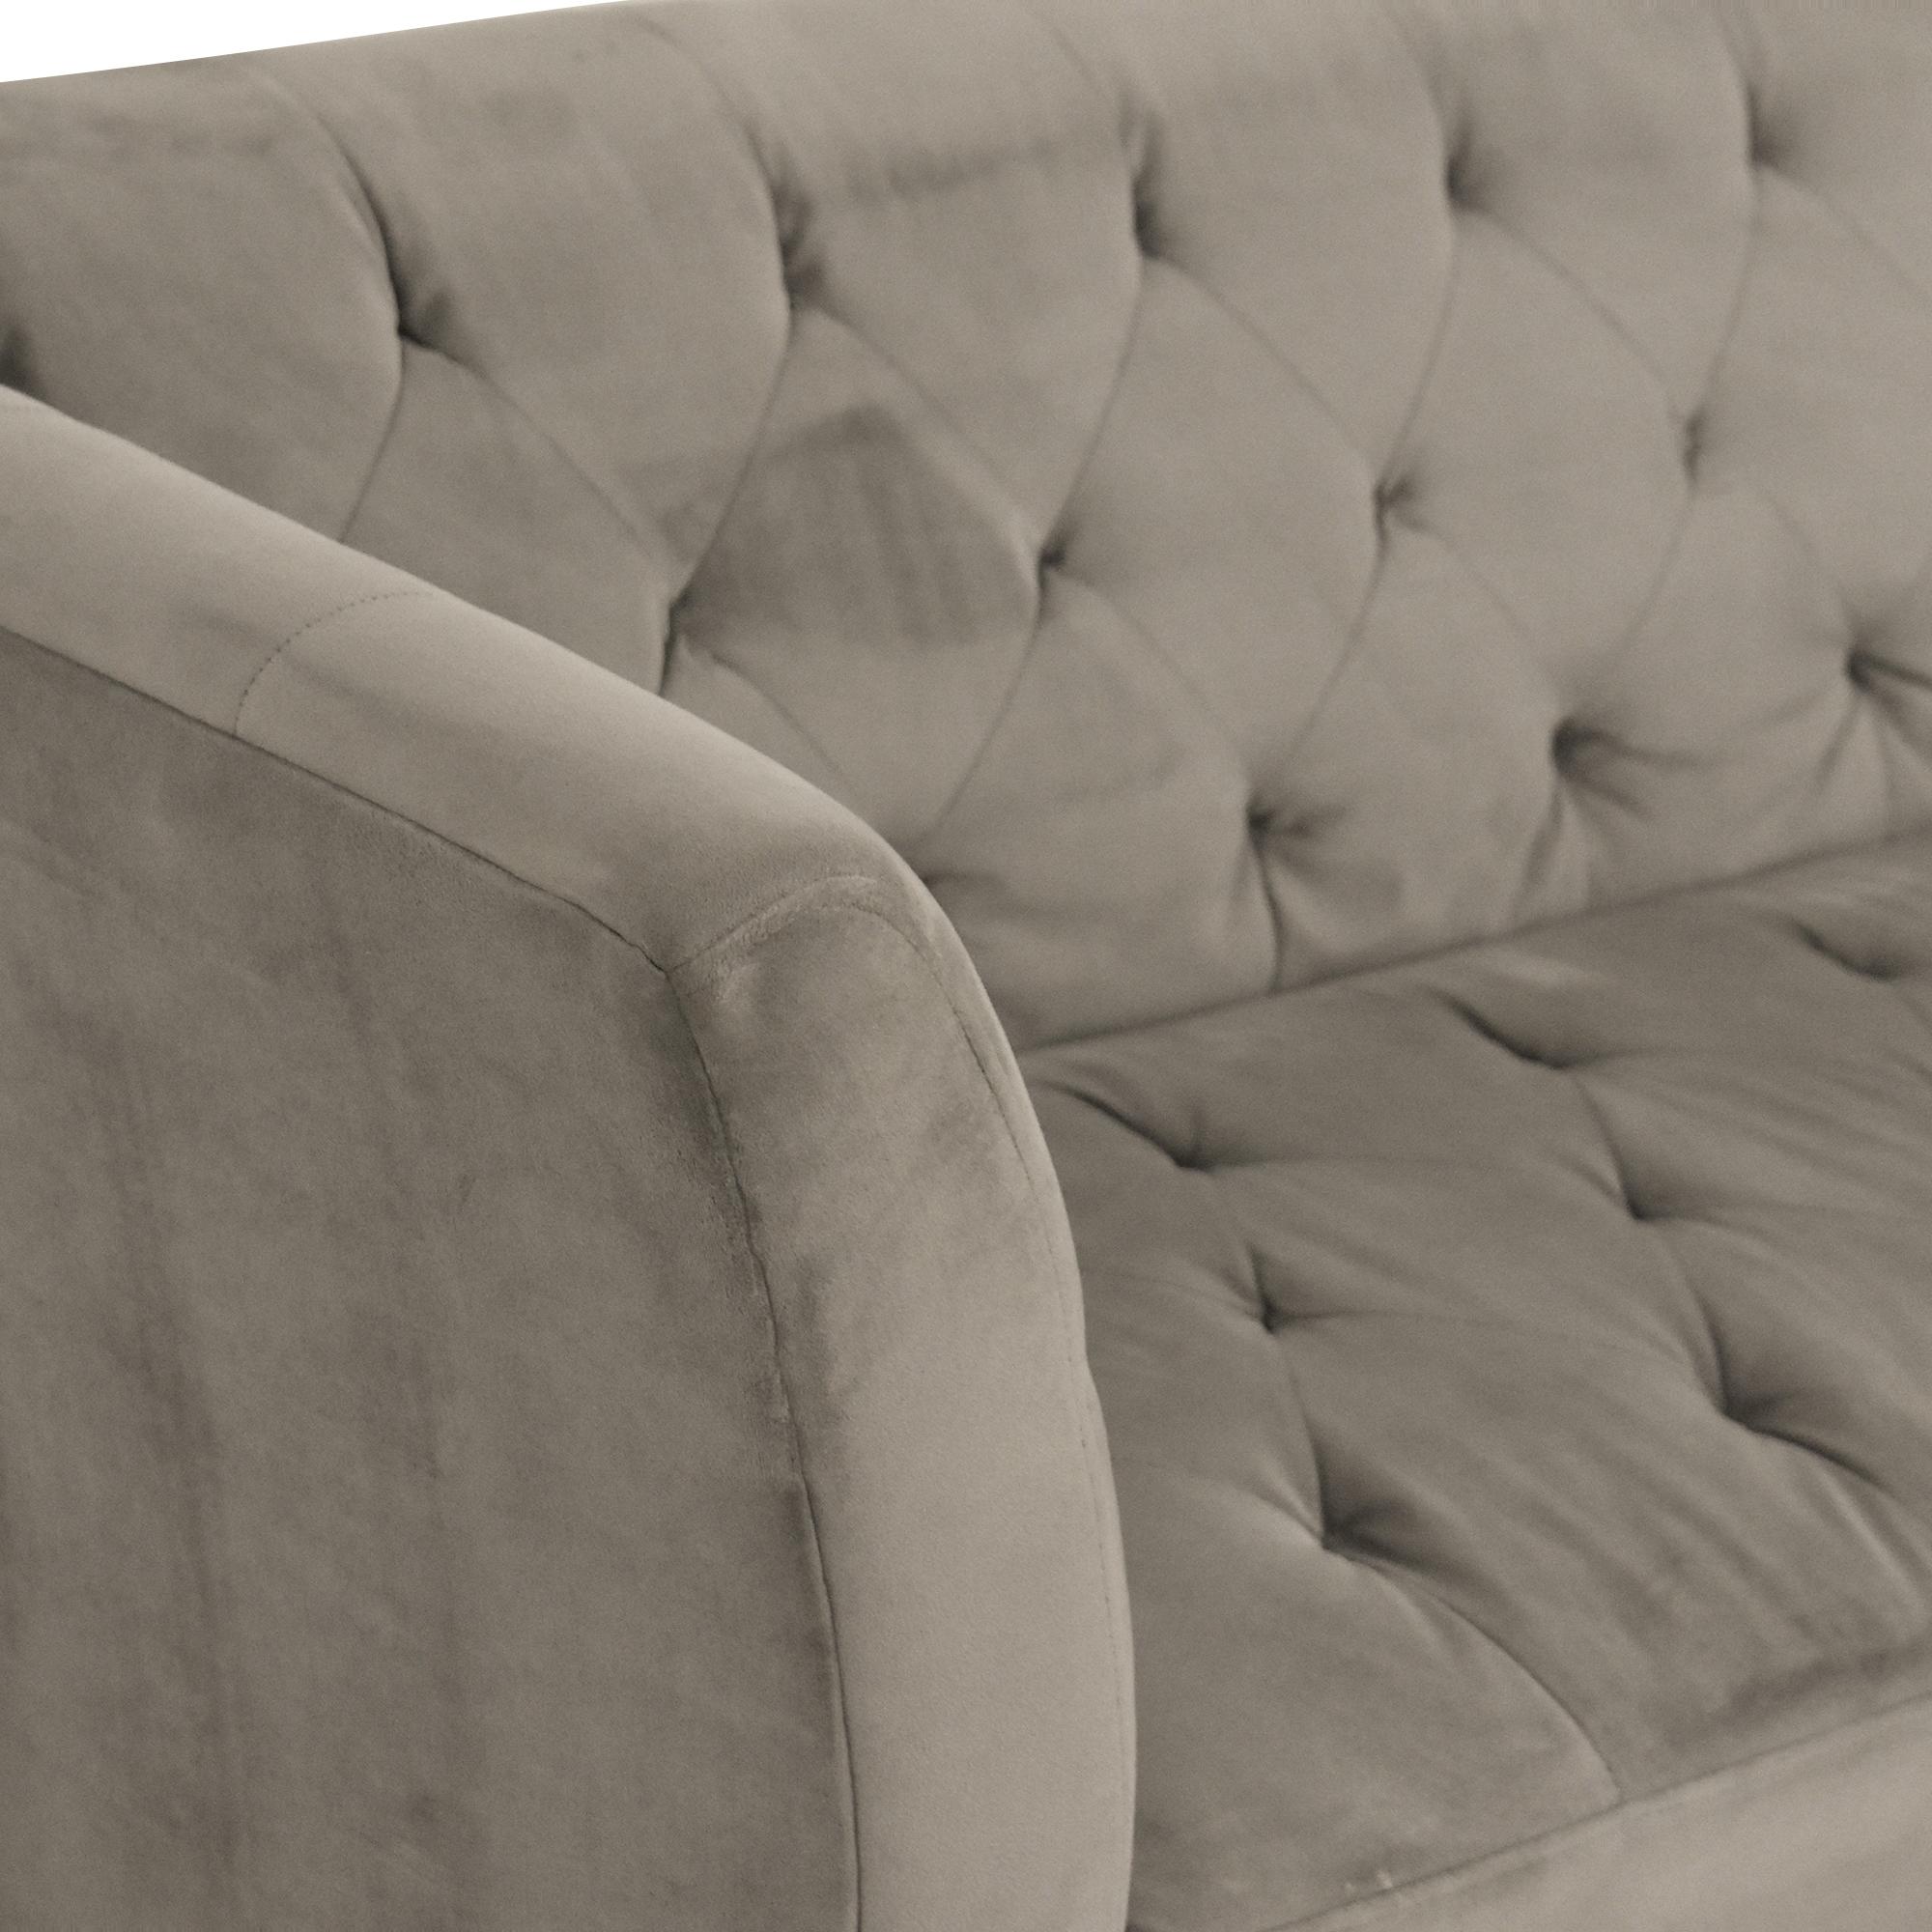 Macy's Macy's Lizbeth Sofa for sale